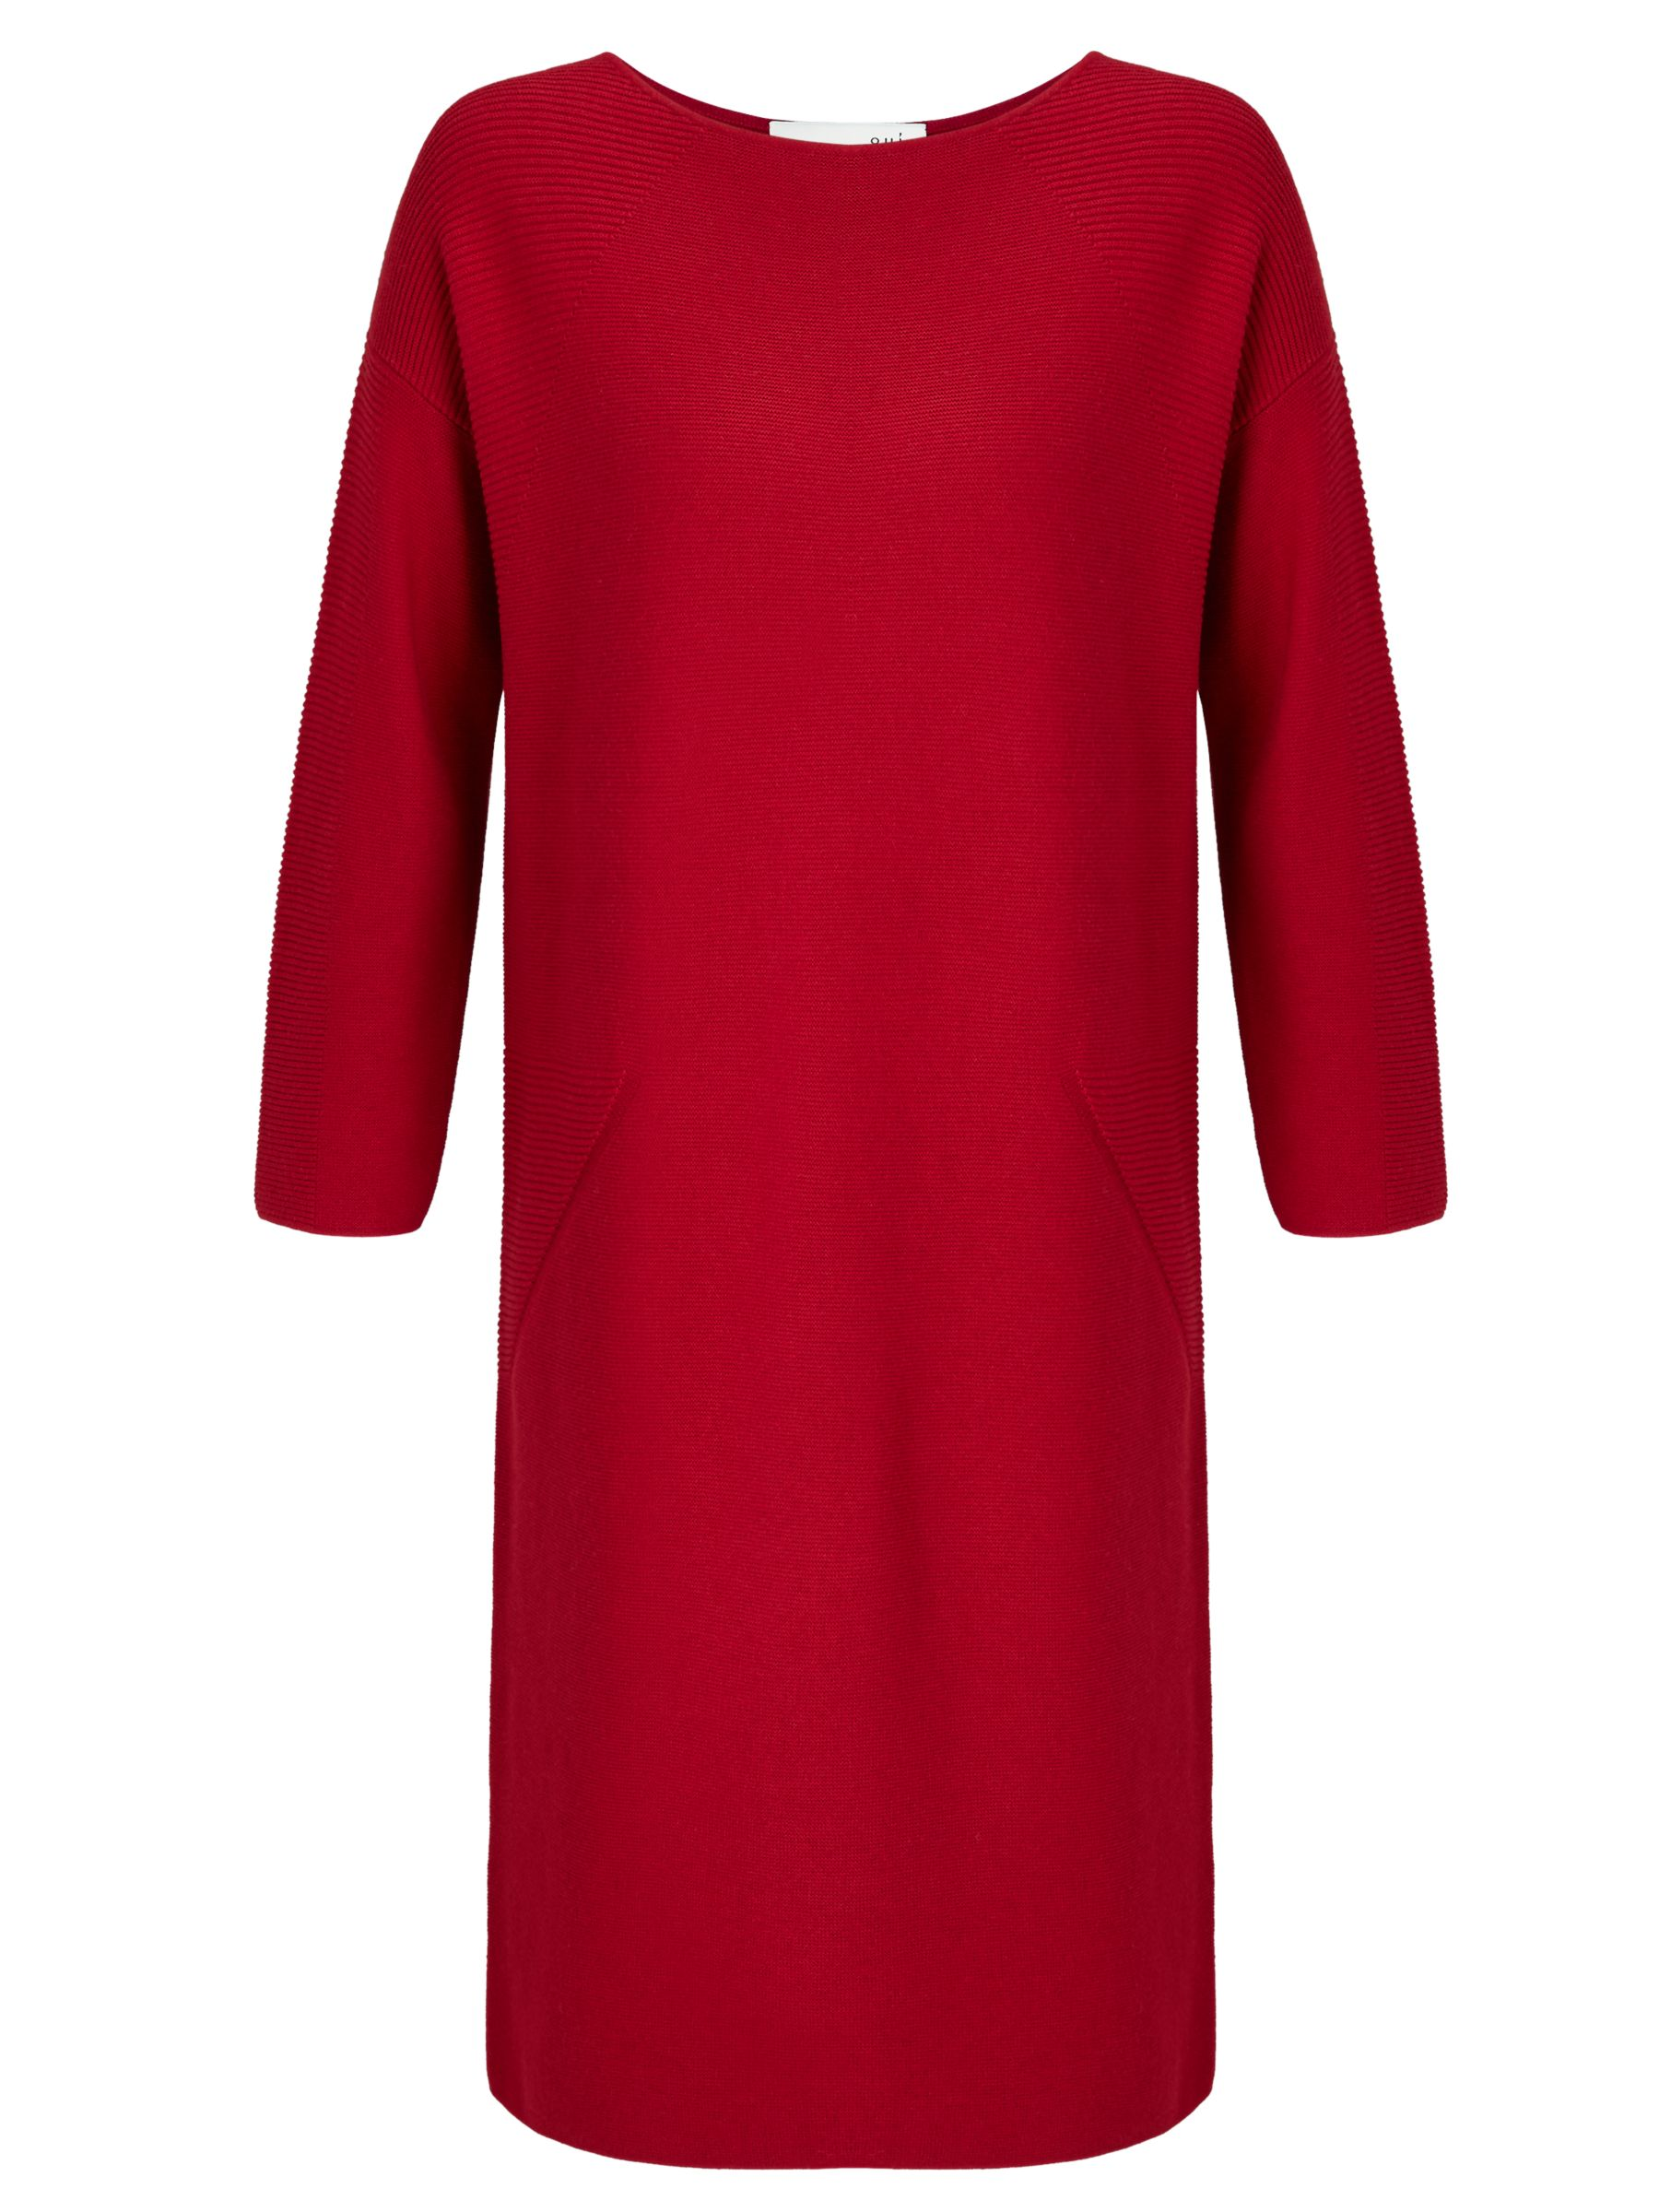 Oui Oui Knitted Dress, Scarlet Sage